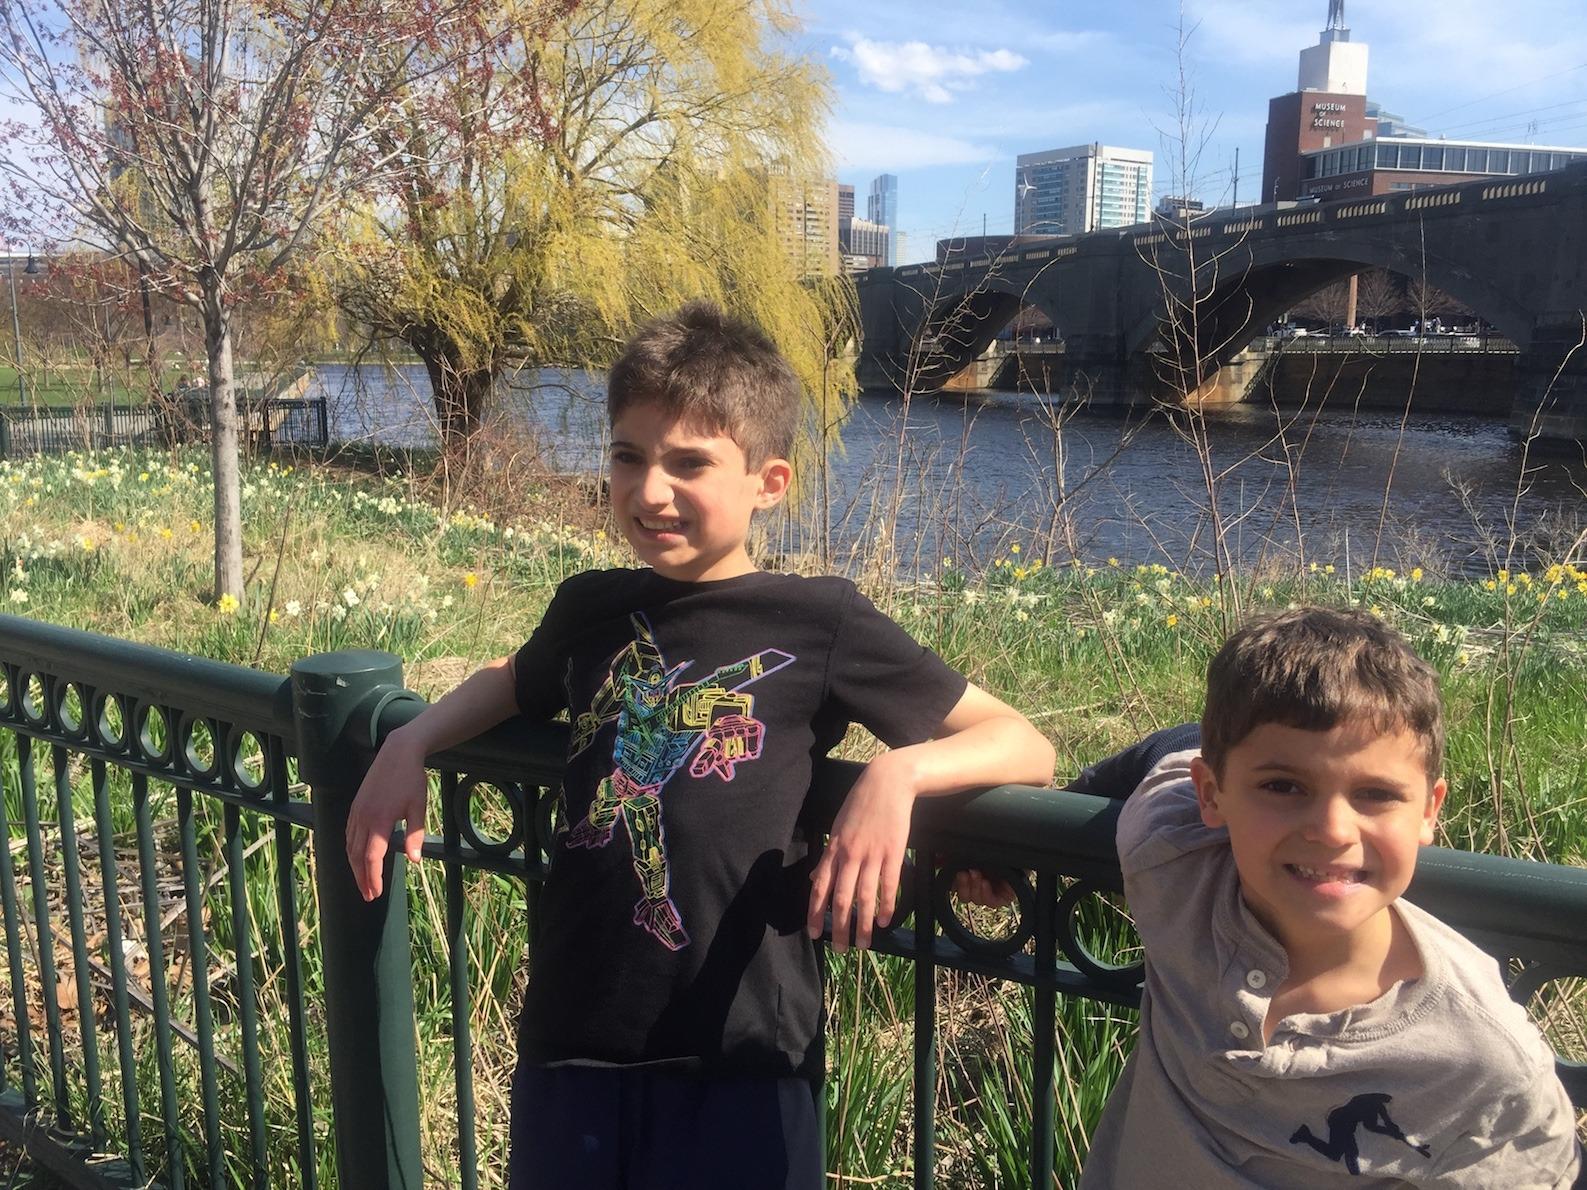 Boys in Boston river Retirement Strategy www.thethreeyearexperiment.com